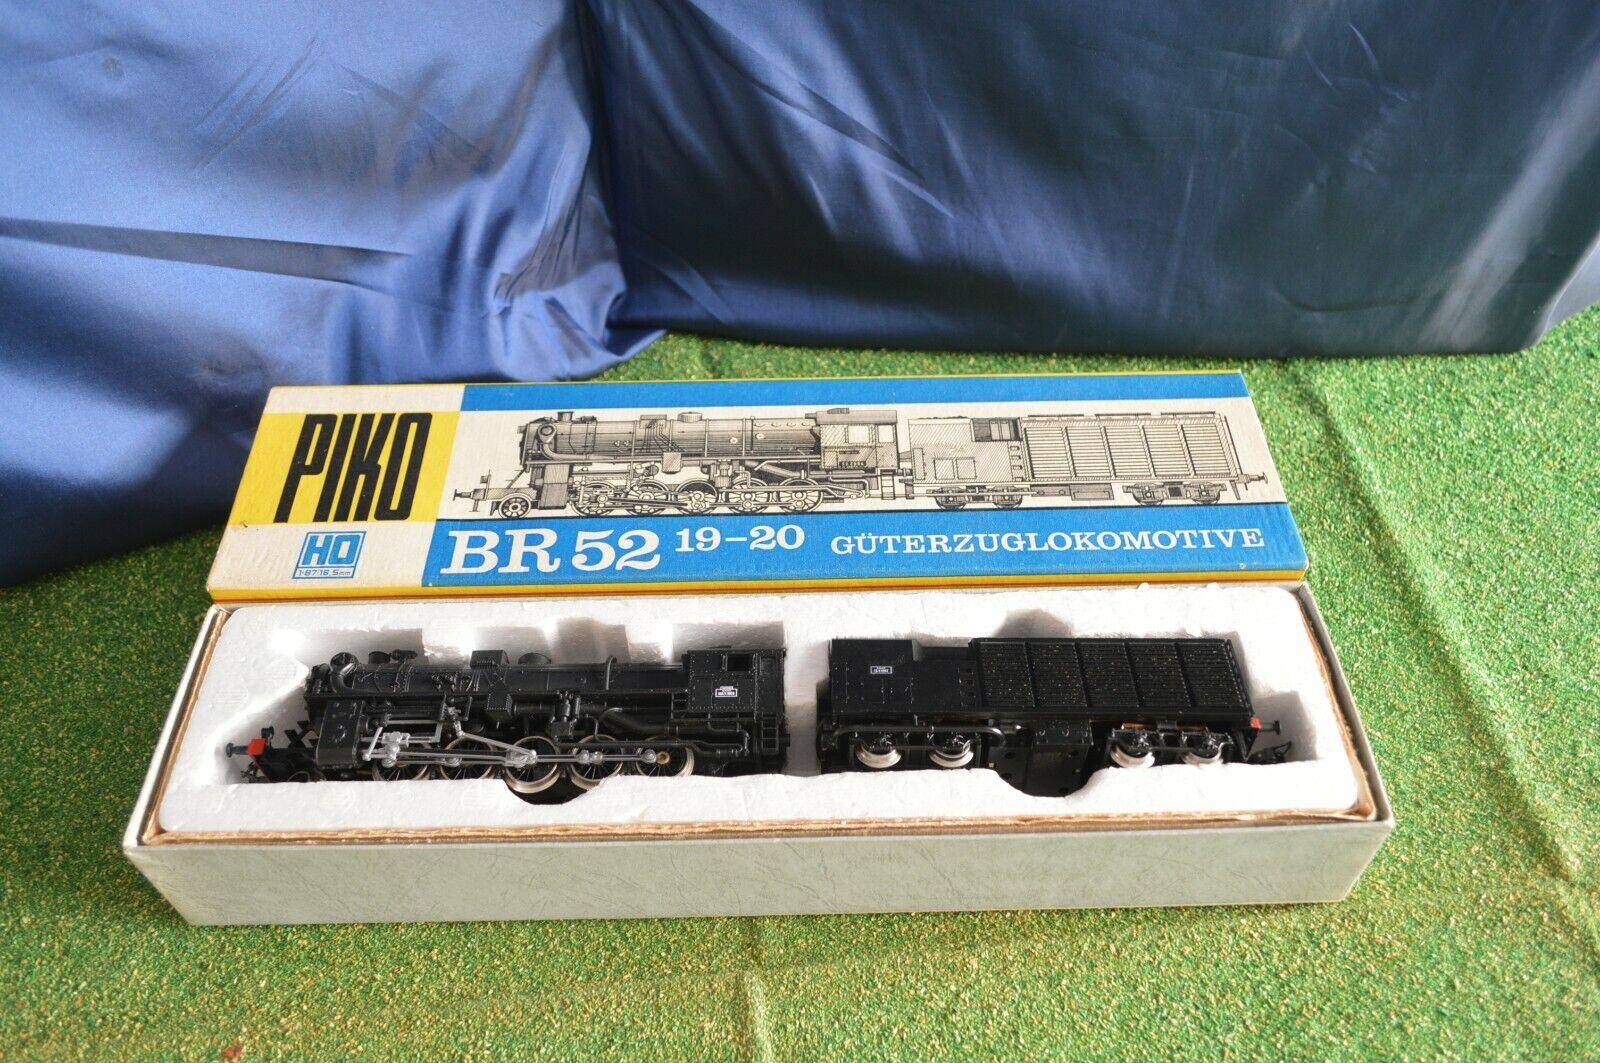 Piko Locomotive Dampf BR52 19-20 in Box Original